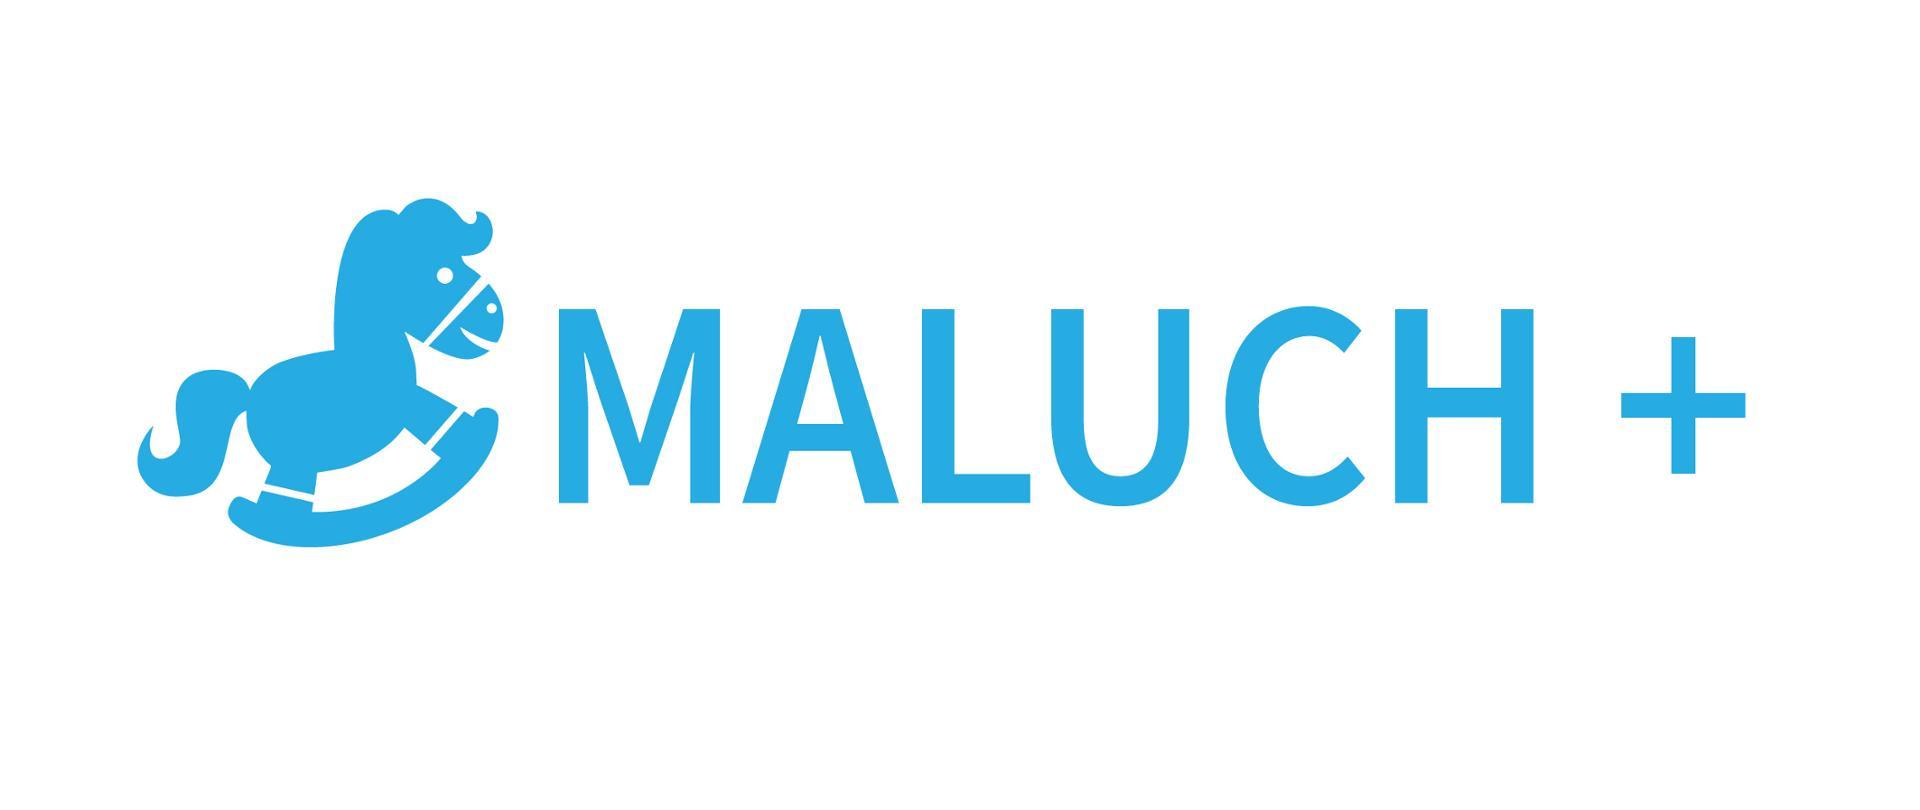 logo programu Maluch +: konik na biegunach